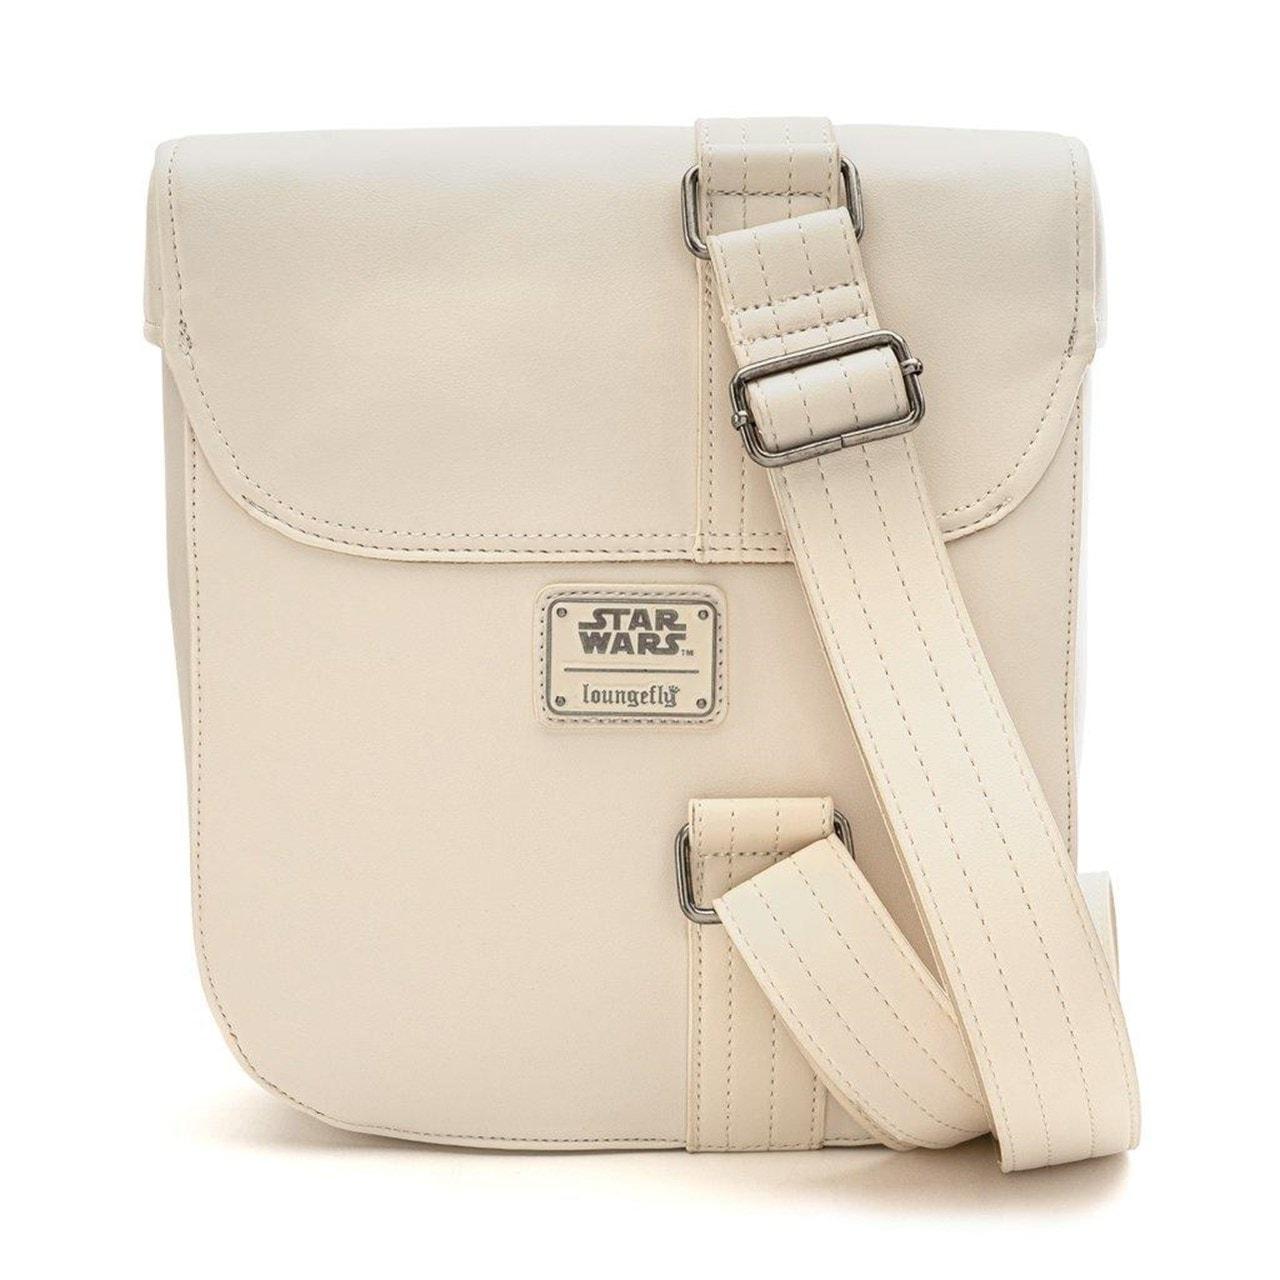 Loungefly X Star Wars Rey Cosplay Sling Bag - 2